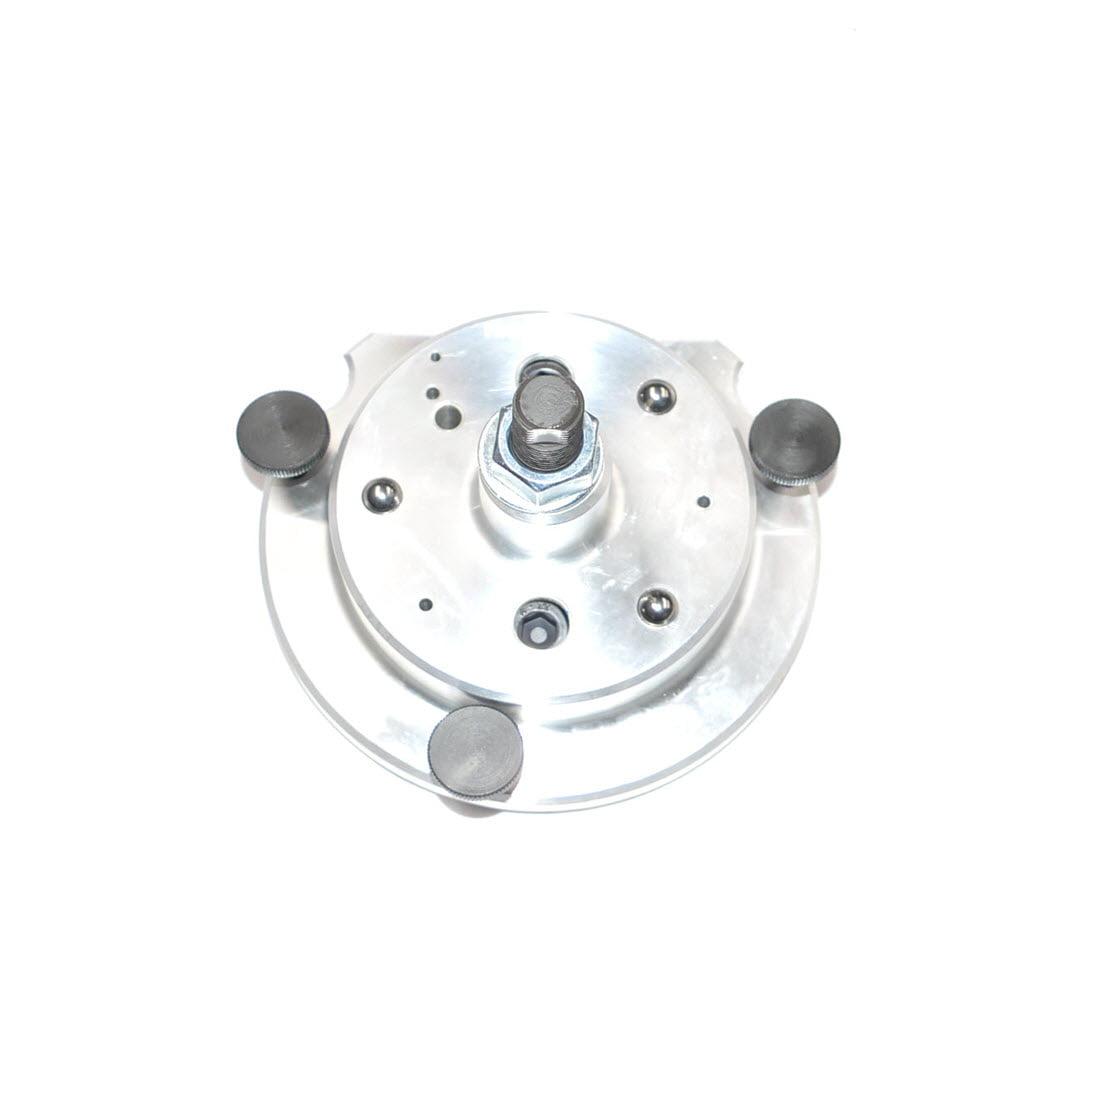 B1514 VAG crank seal tool